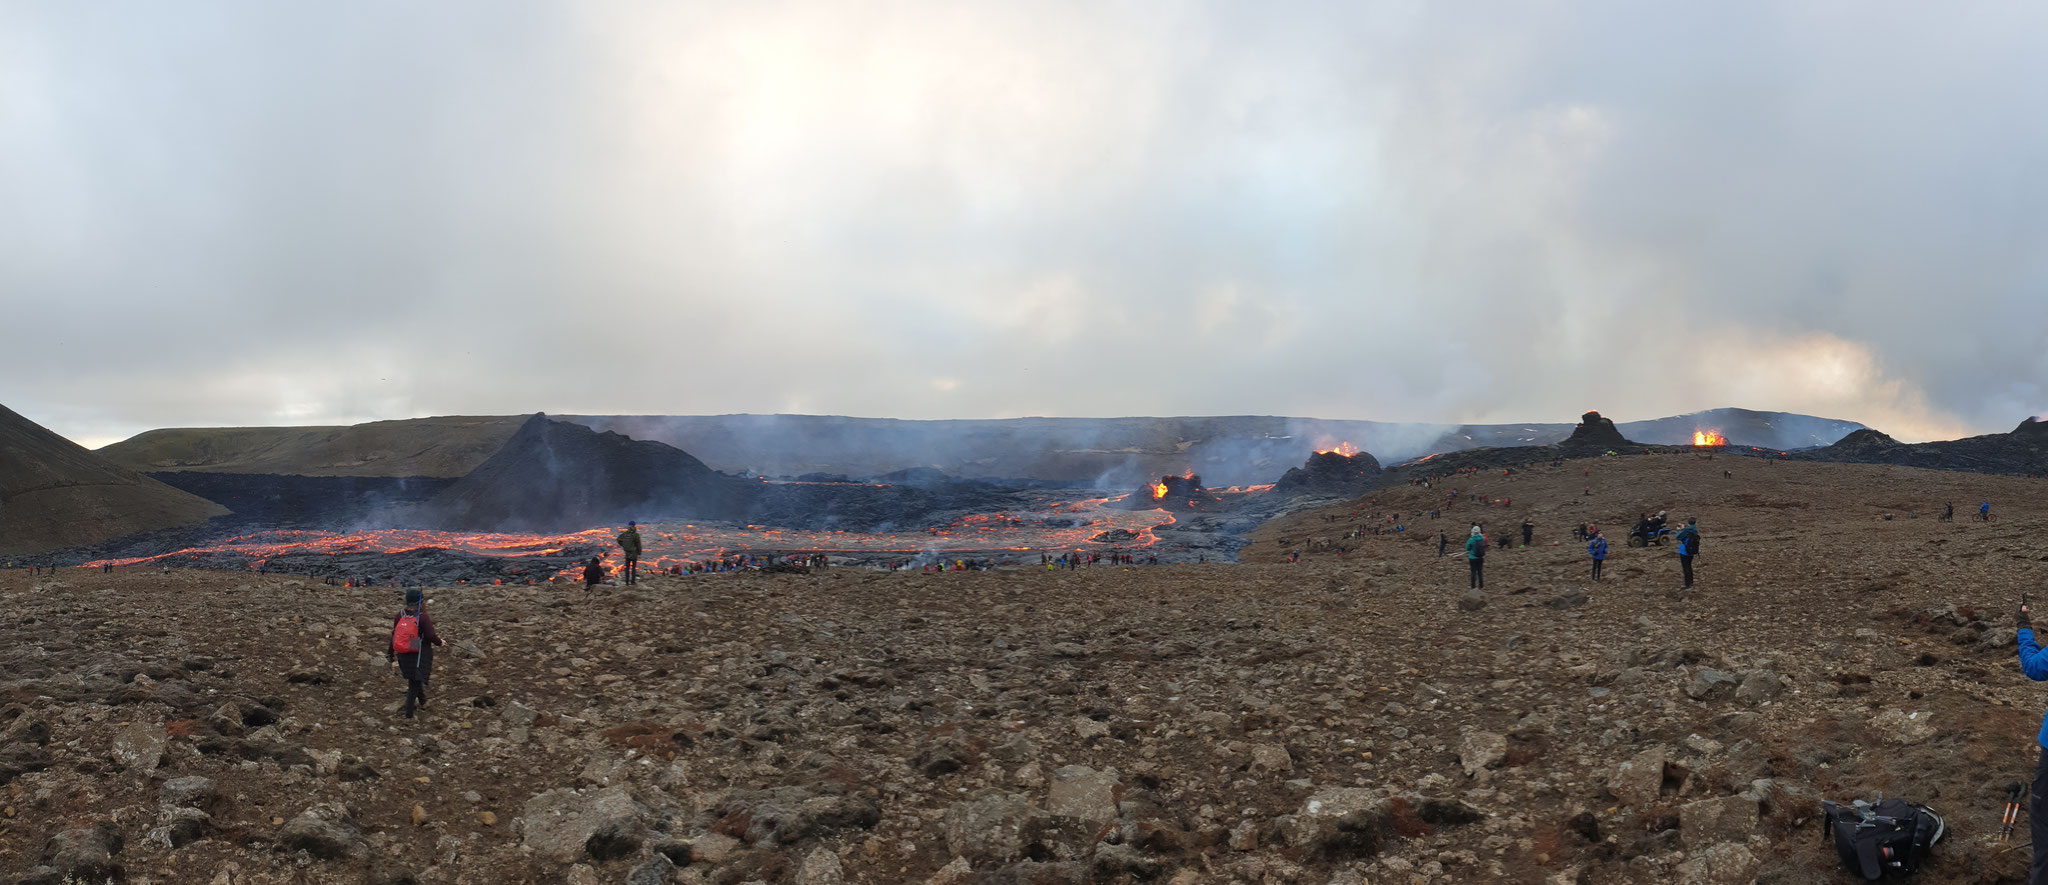 Alle an einem Tag aktiven Krater